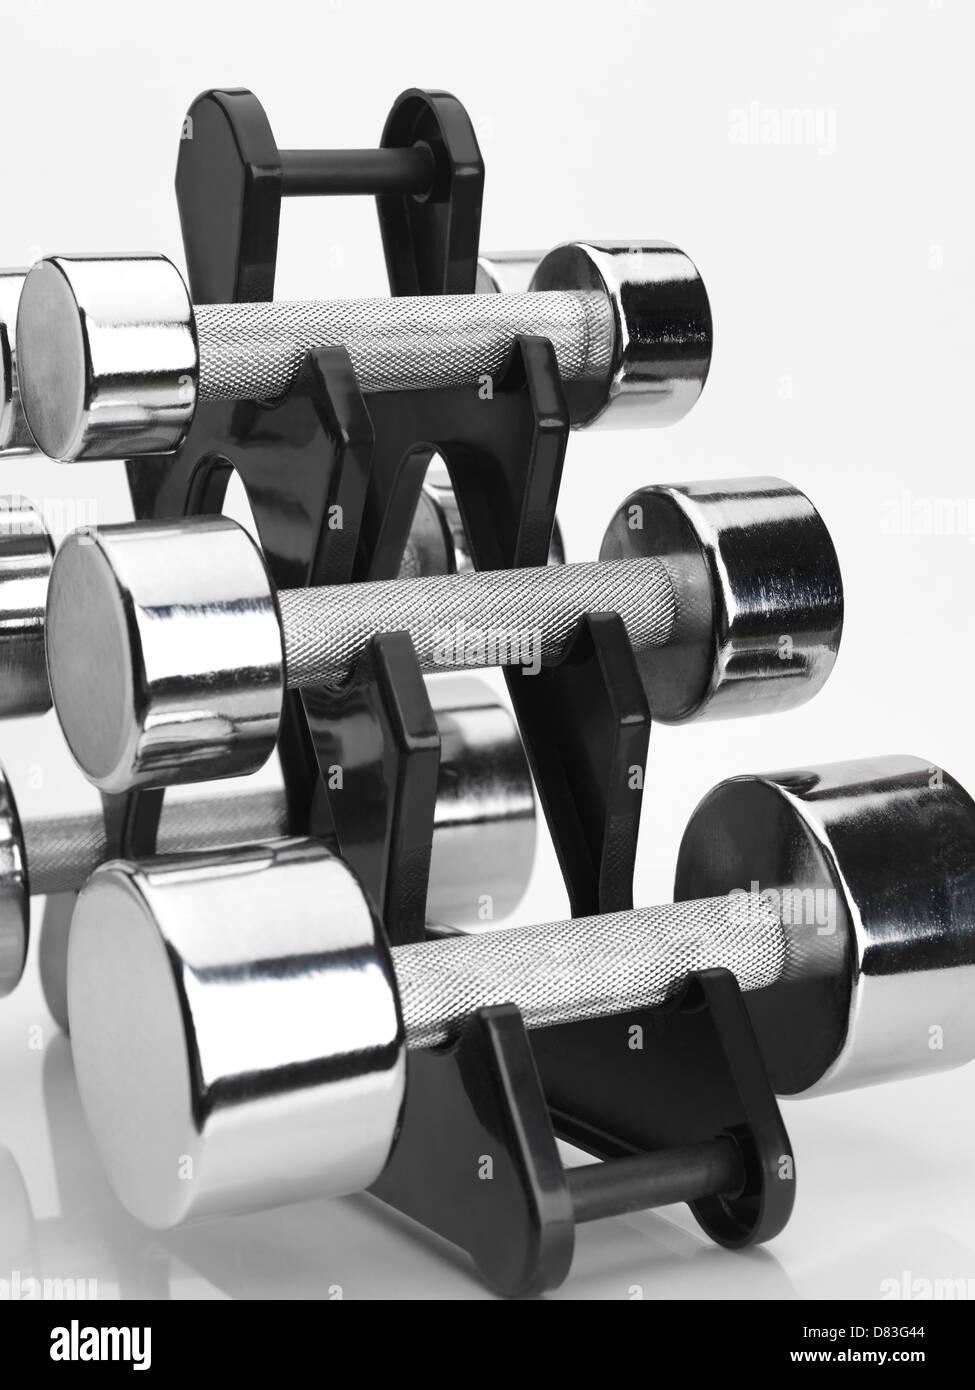 Rack with a set of shiny chrome dumbbells isolated on white background - Stock Image